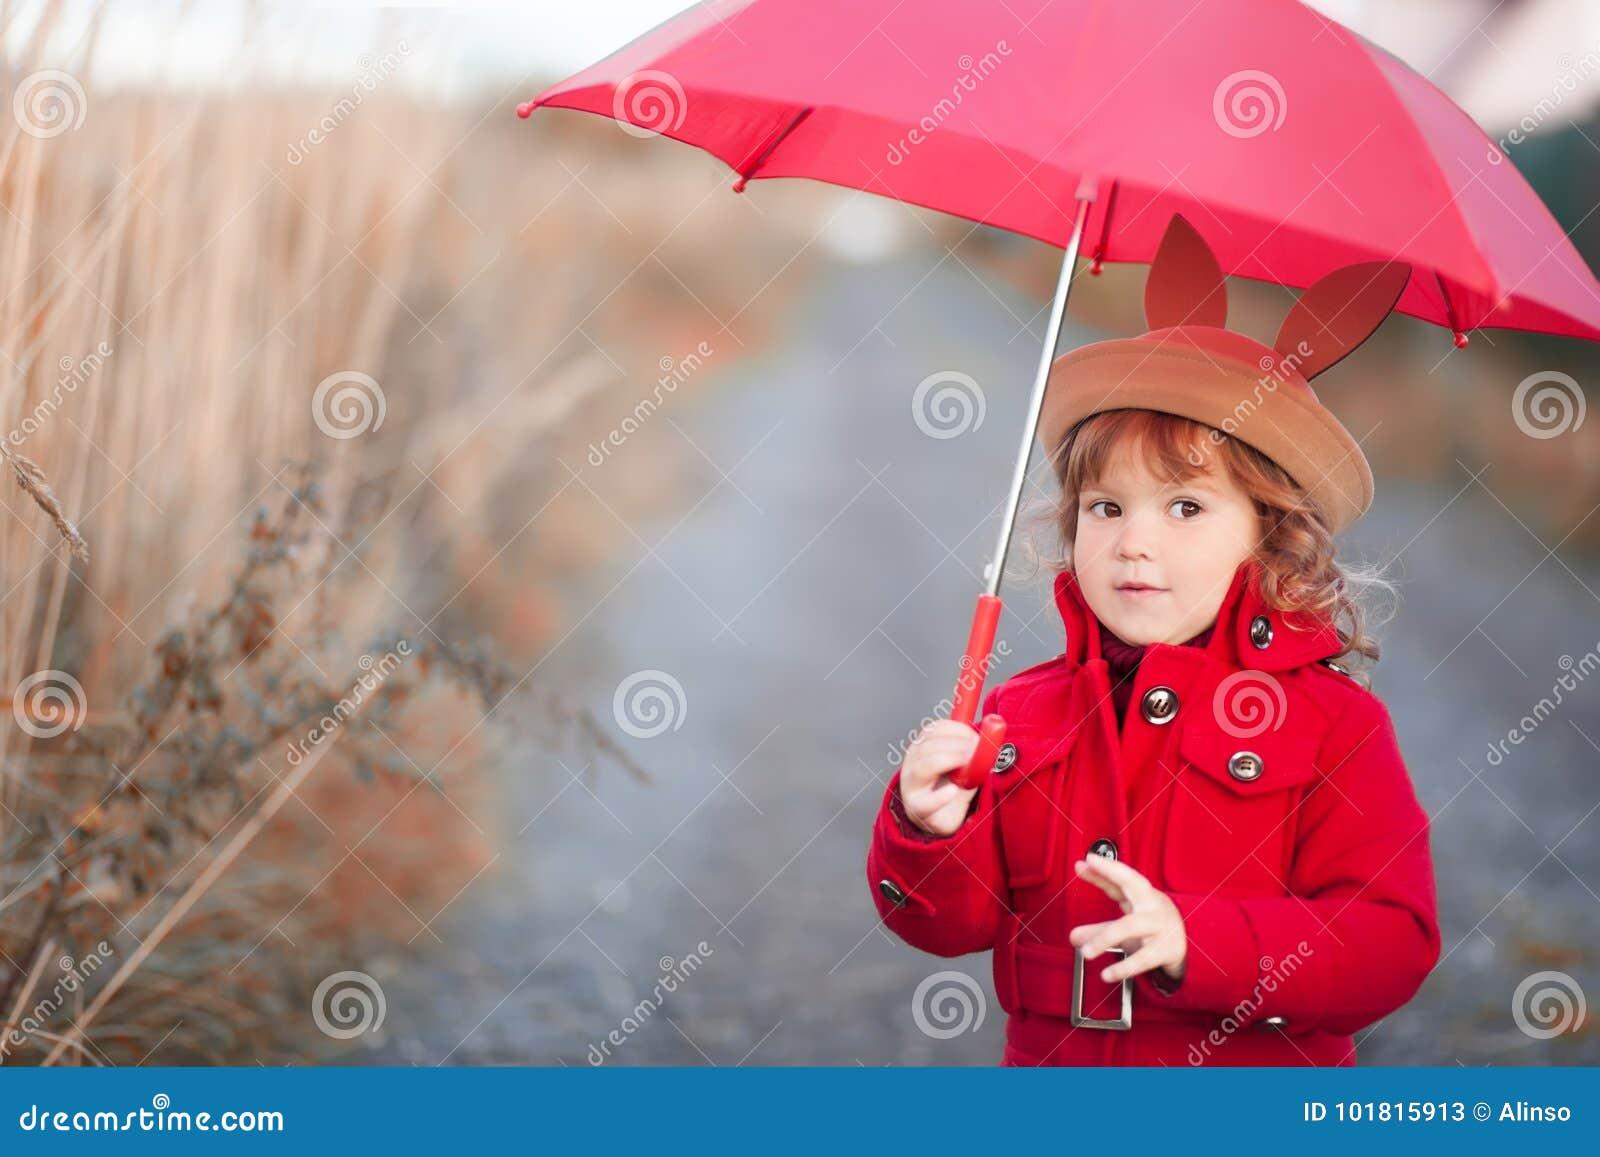 fdb400e8b Little Girl Walking With Umbrella